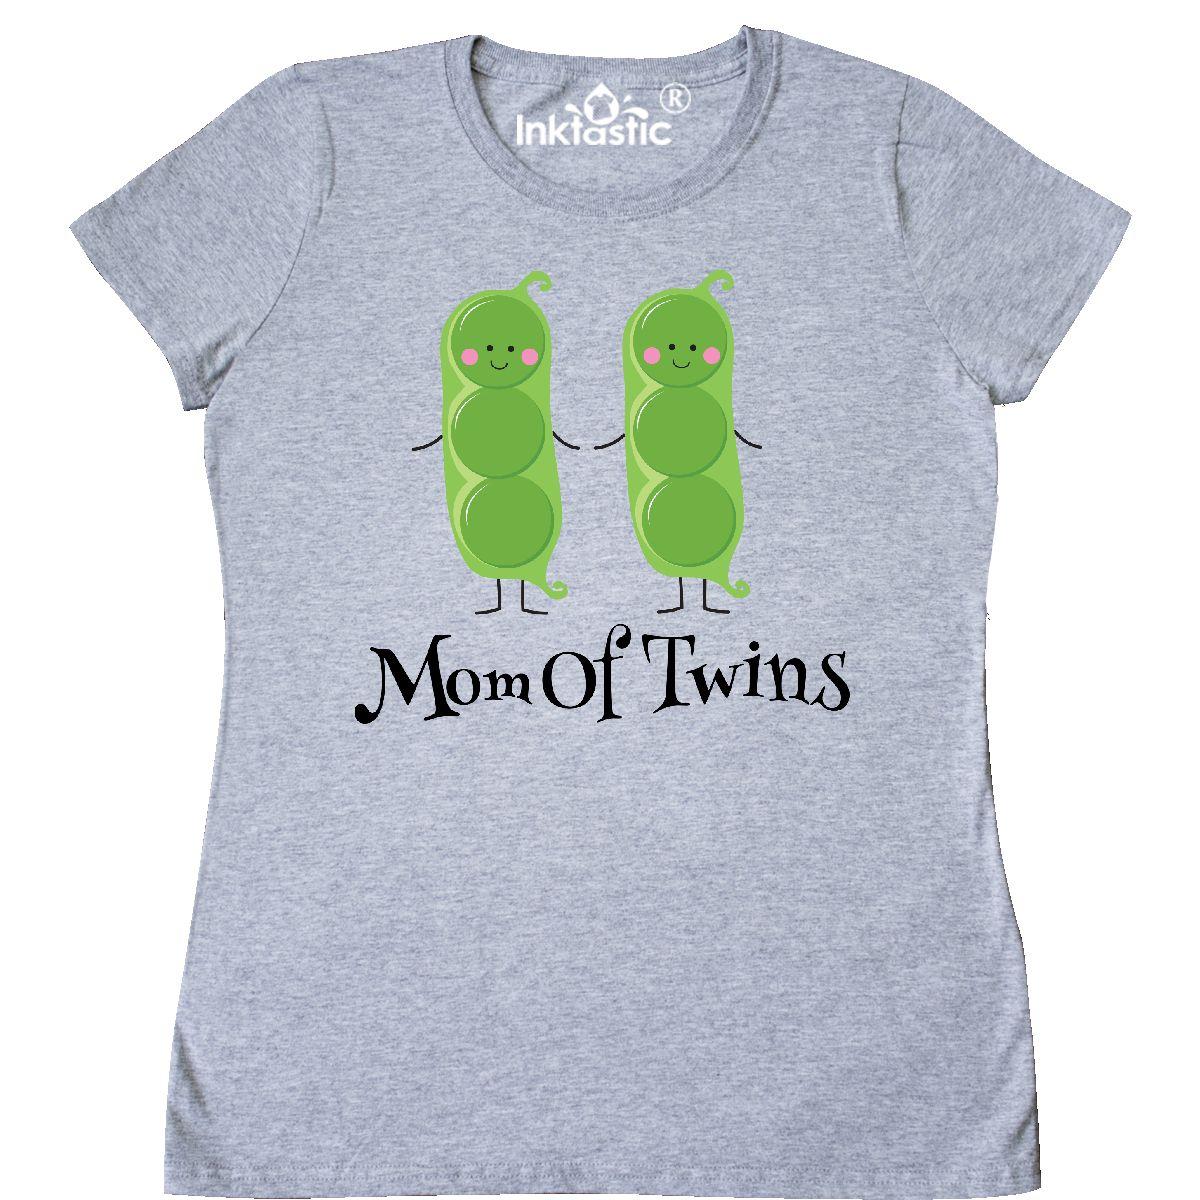 b09e1ea02c14c Inktastic Mom Of Twins Pea Pod Babies Women's T-Shirt Mother Twin ...